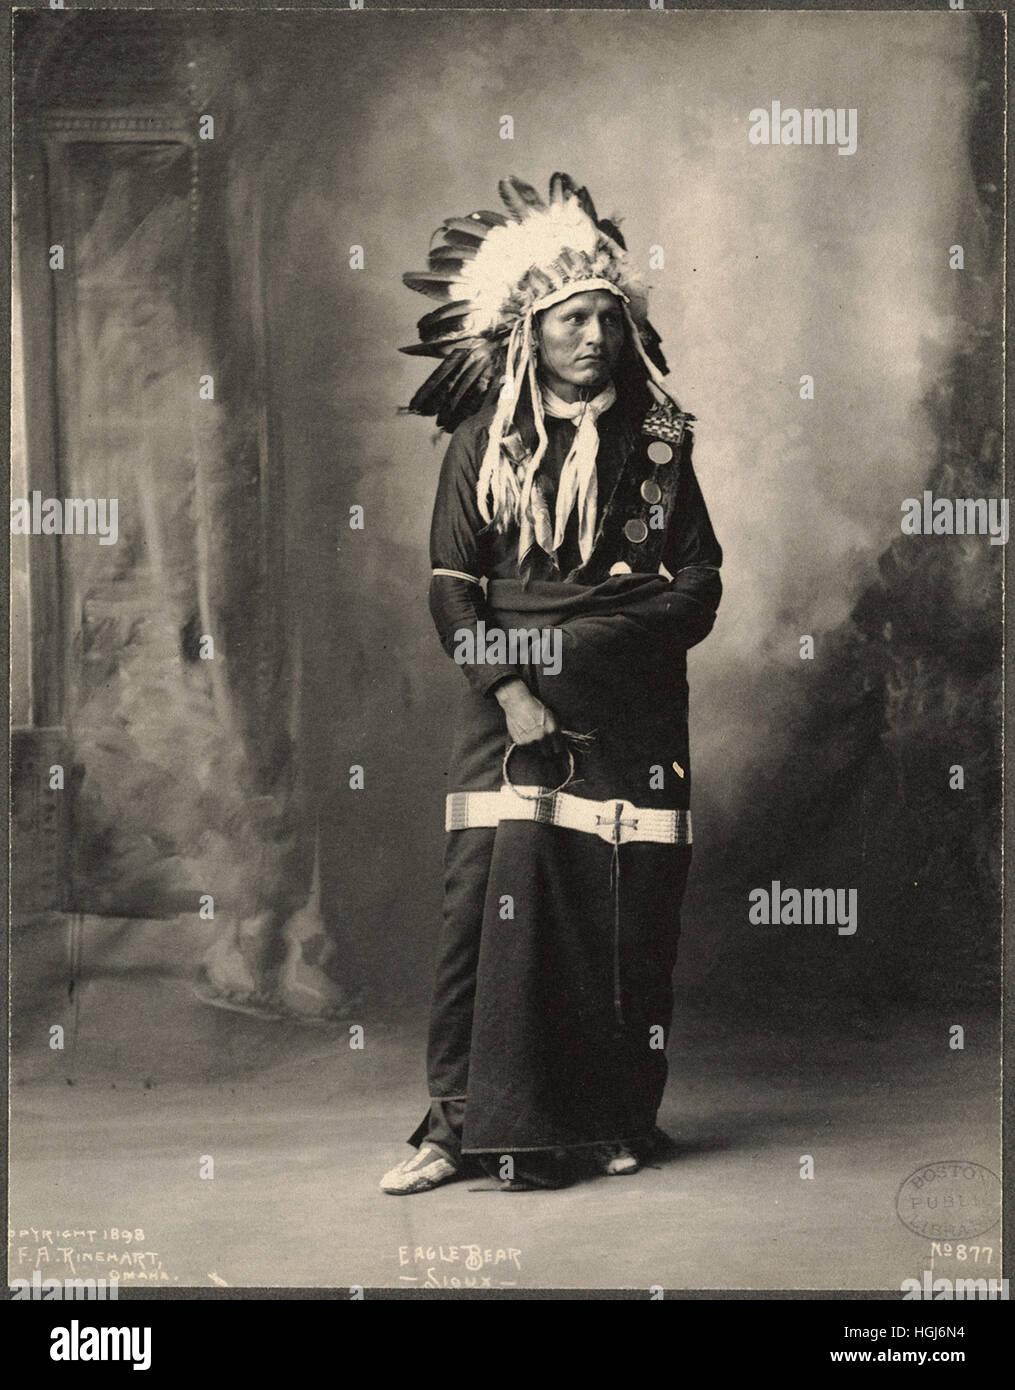 Eagle Bear, Sioux   - 1898 Indian Congress - Photo : Frank A. Rinehart - Stock Image